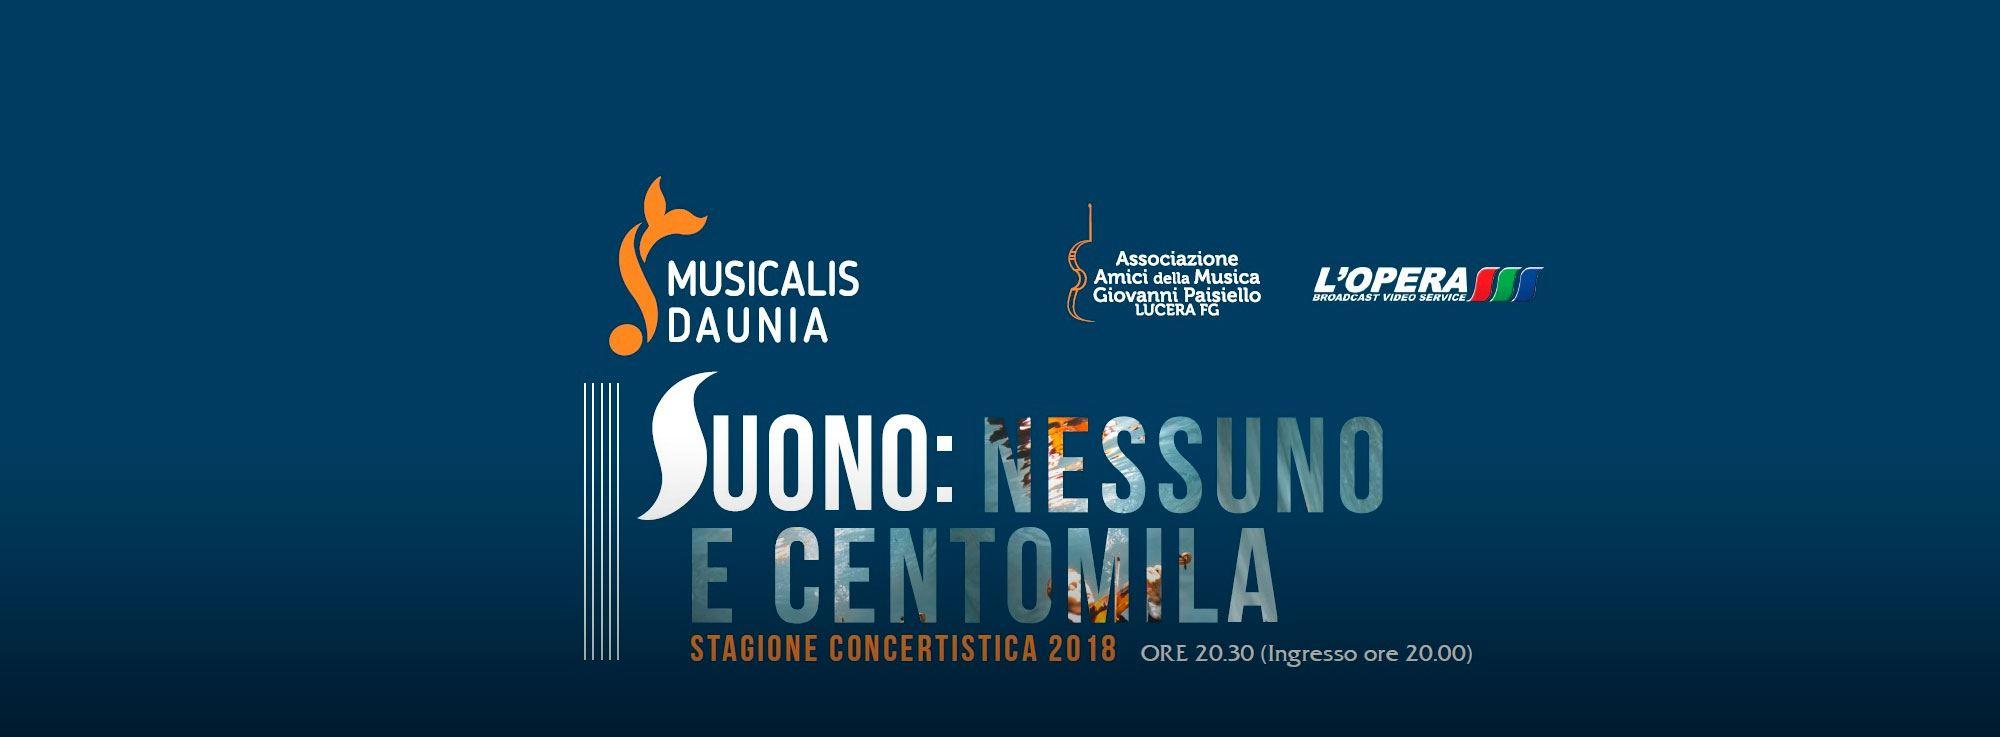 Lucera: Musicalis Daunia